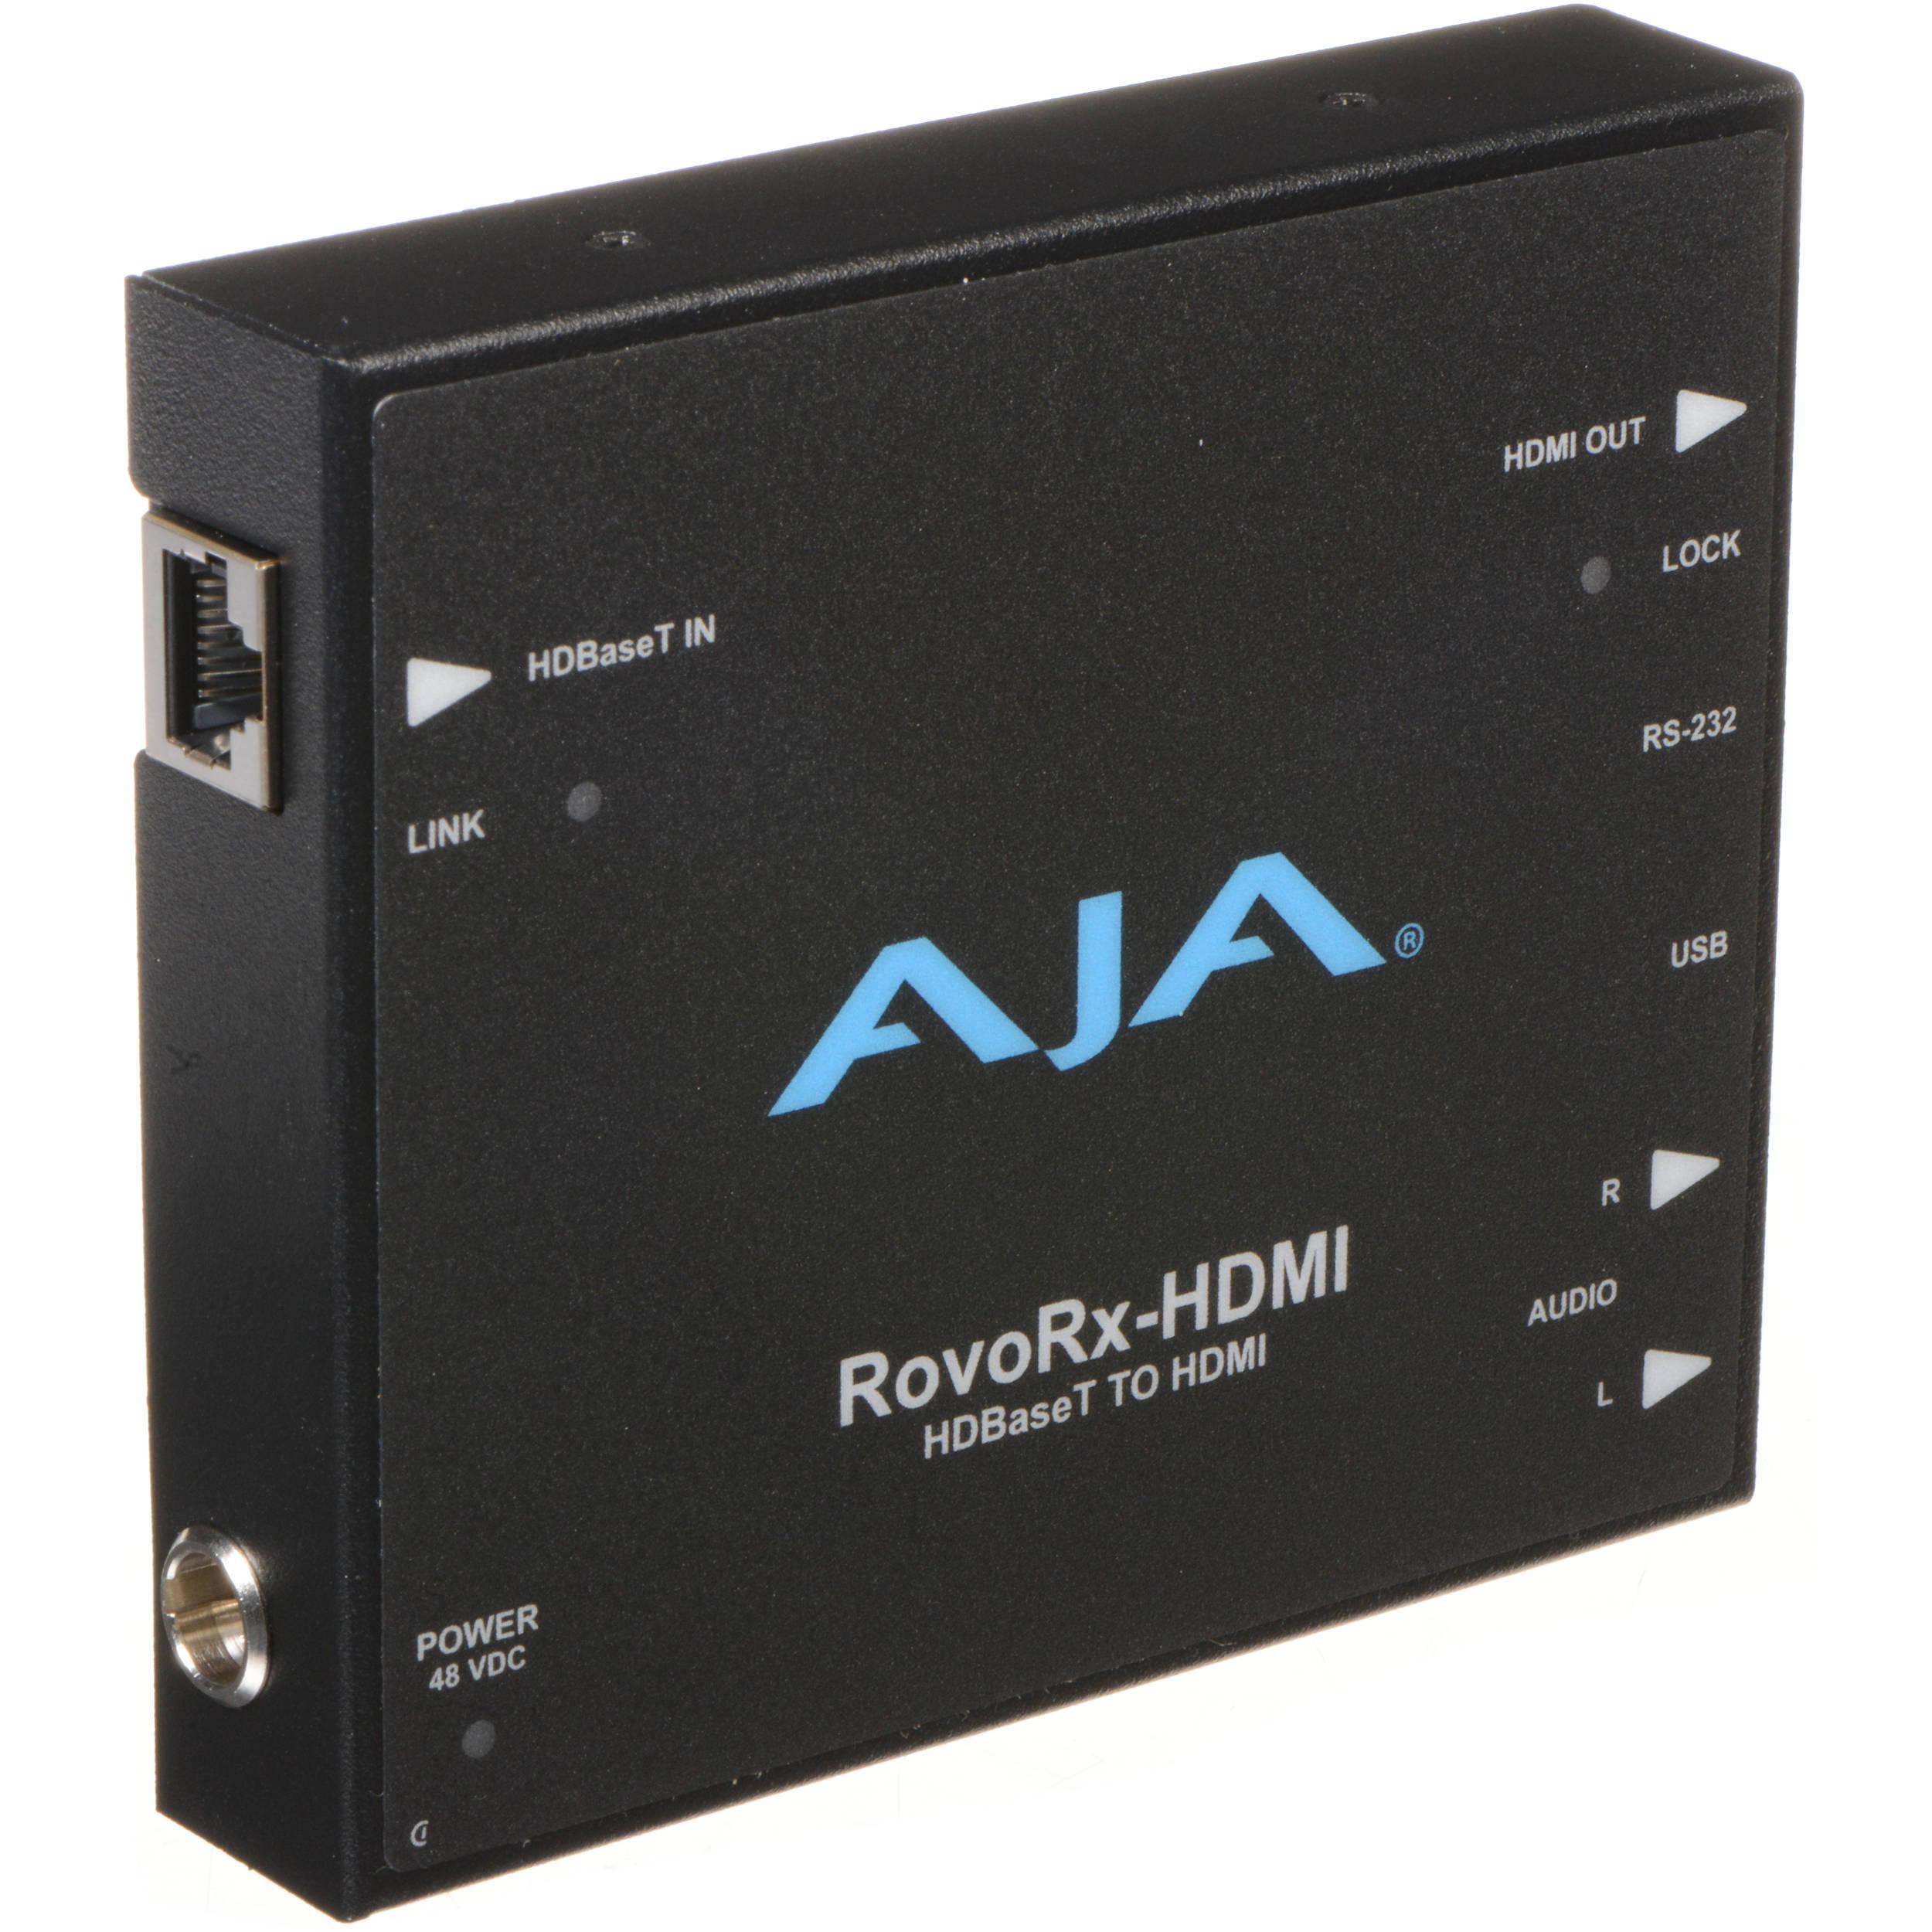 Aja Rovorx Hdmi Hdbaset To Receiver Bh Photo Rca Cable Tv Besides Vga Converter Diagram